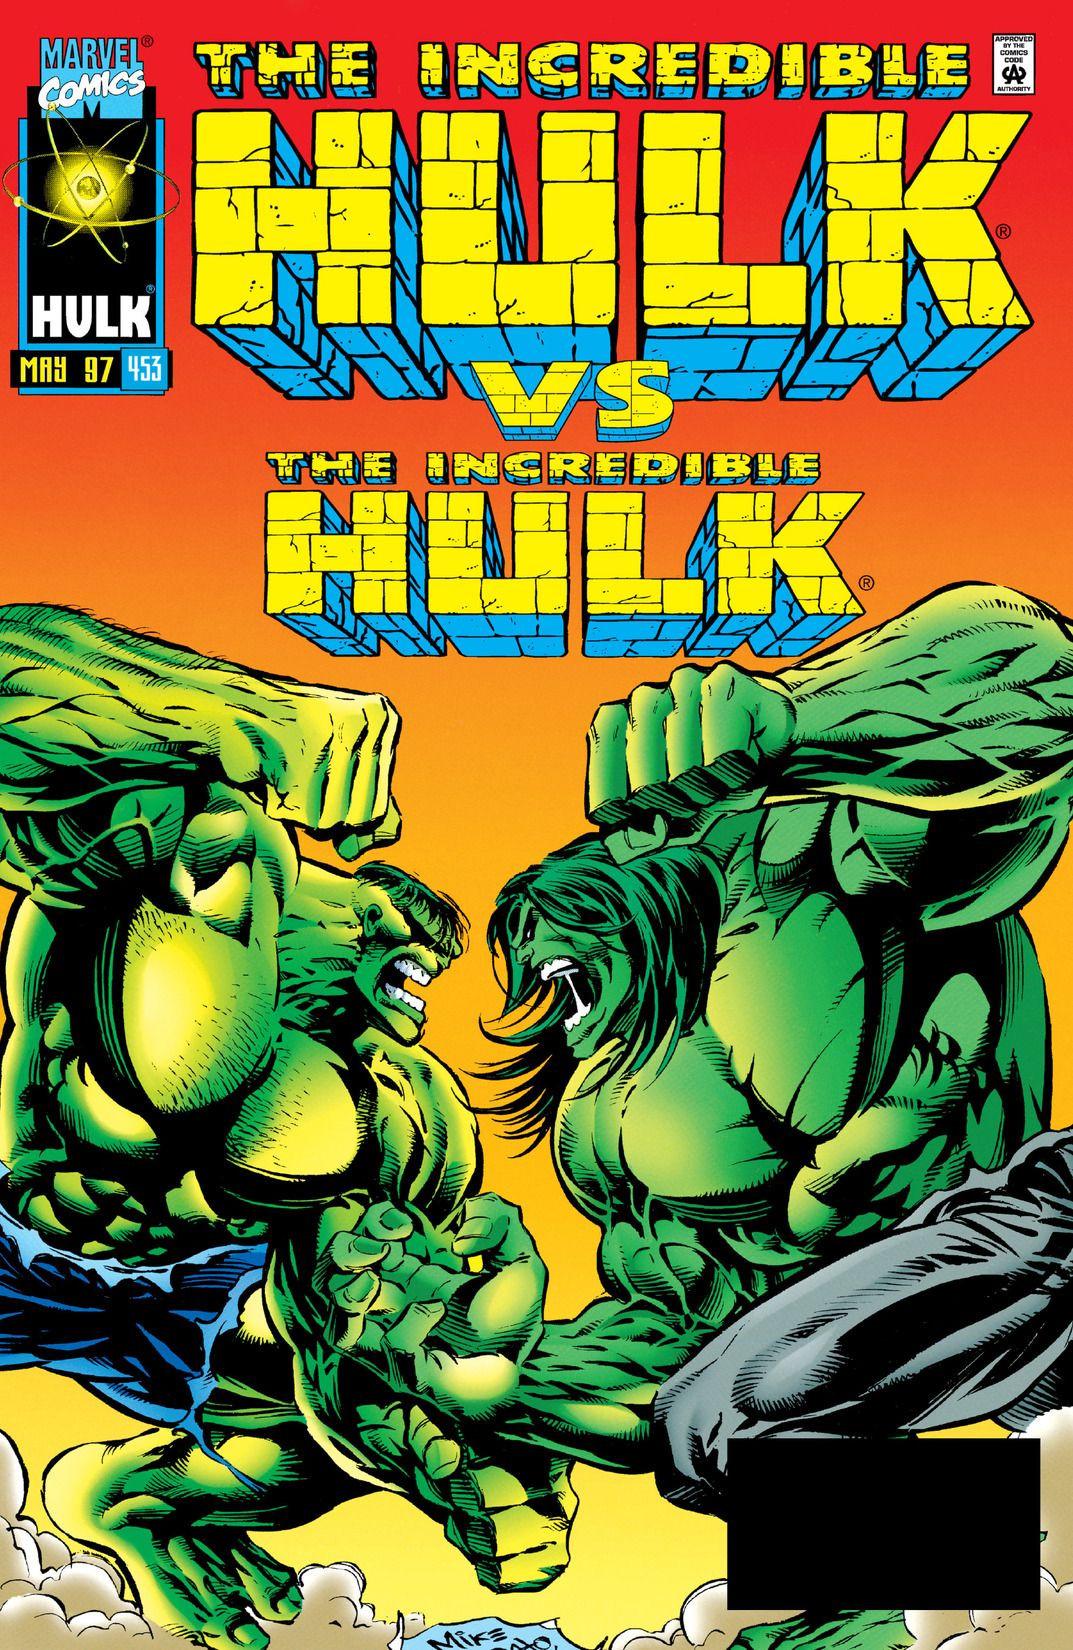 Red Hulk Vs Green Hulk Vs Gray Hulk Stark industries became a